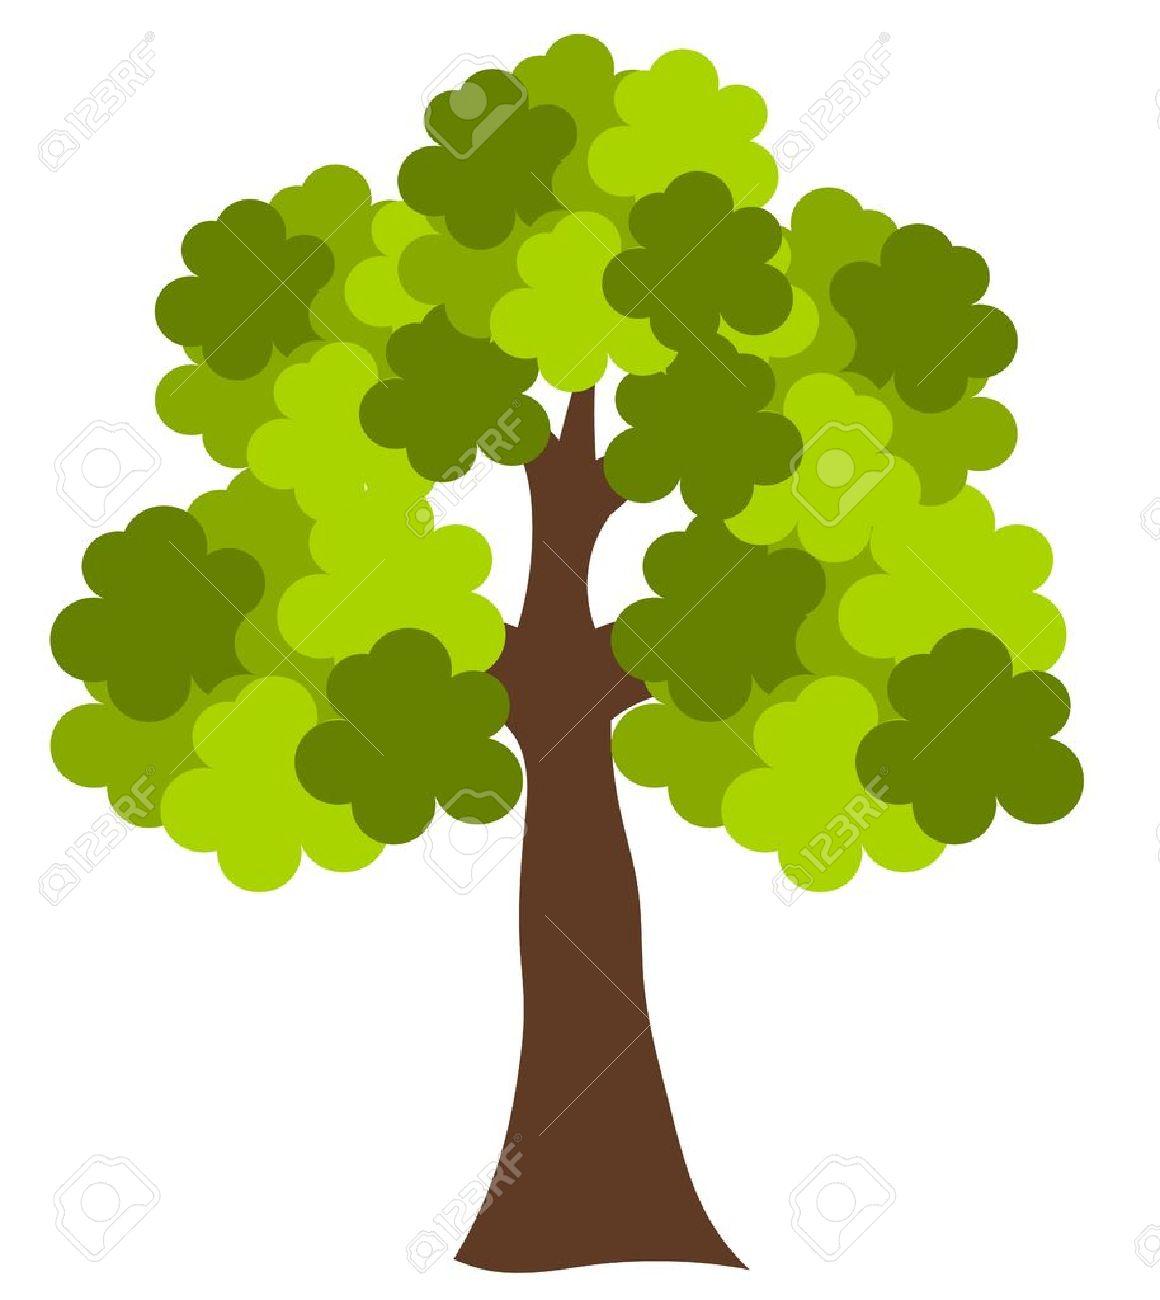 big green oak tree vector illustration royalty free cliparts rh 123rf com oak tree vector silhouette oak tree vector download